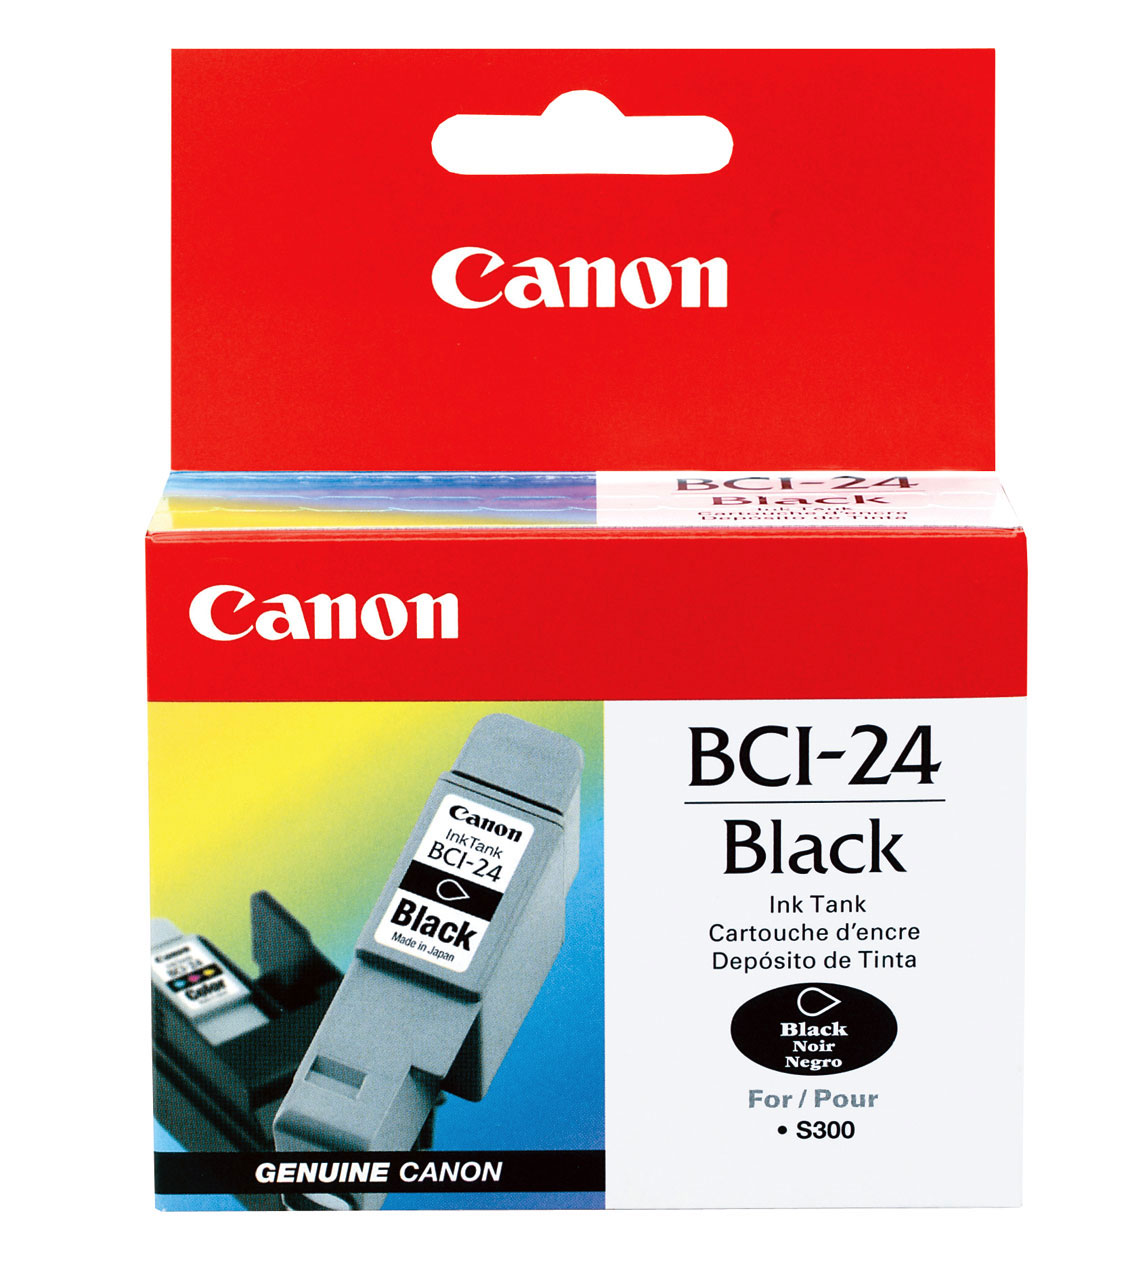 Canon Ink Cartridges Print Tinta Black Noir 1 Liter Bci 24b